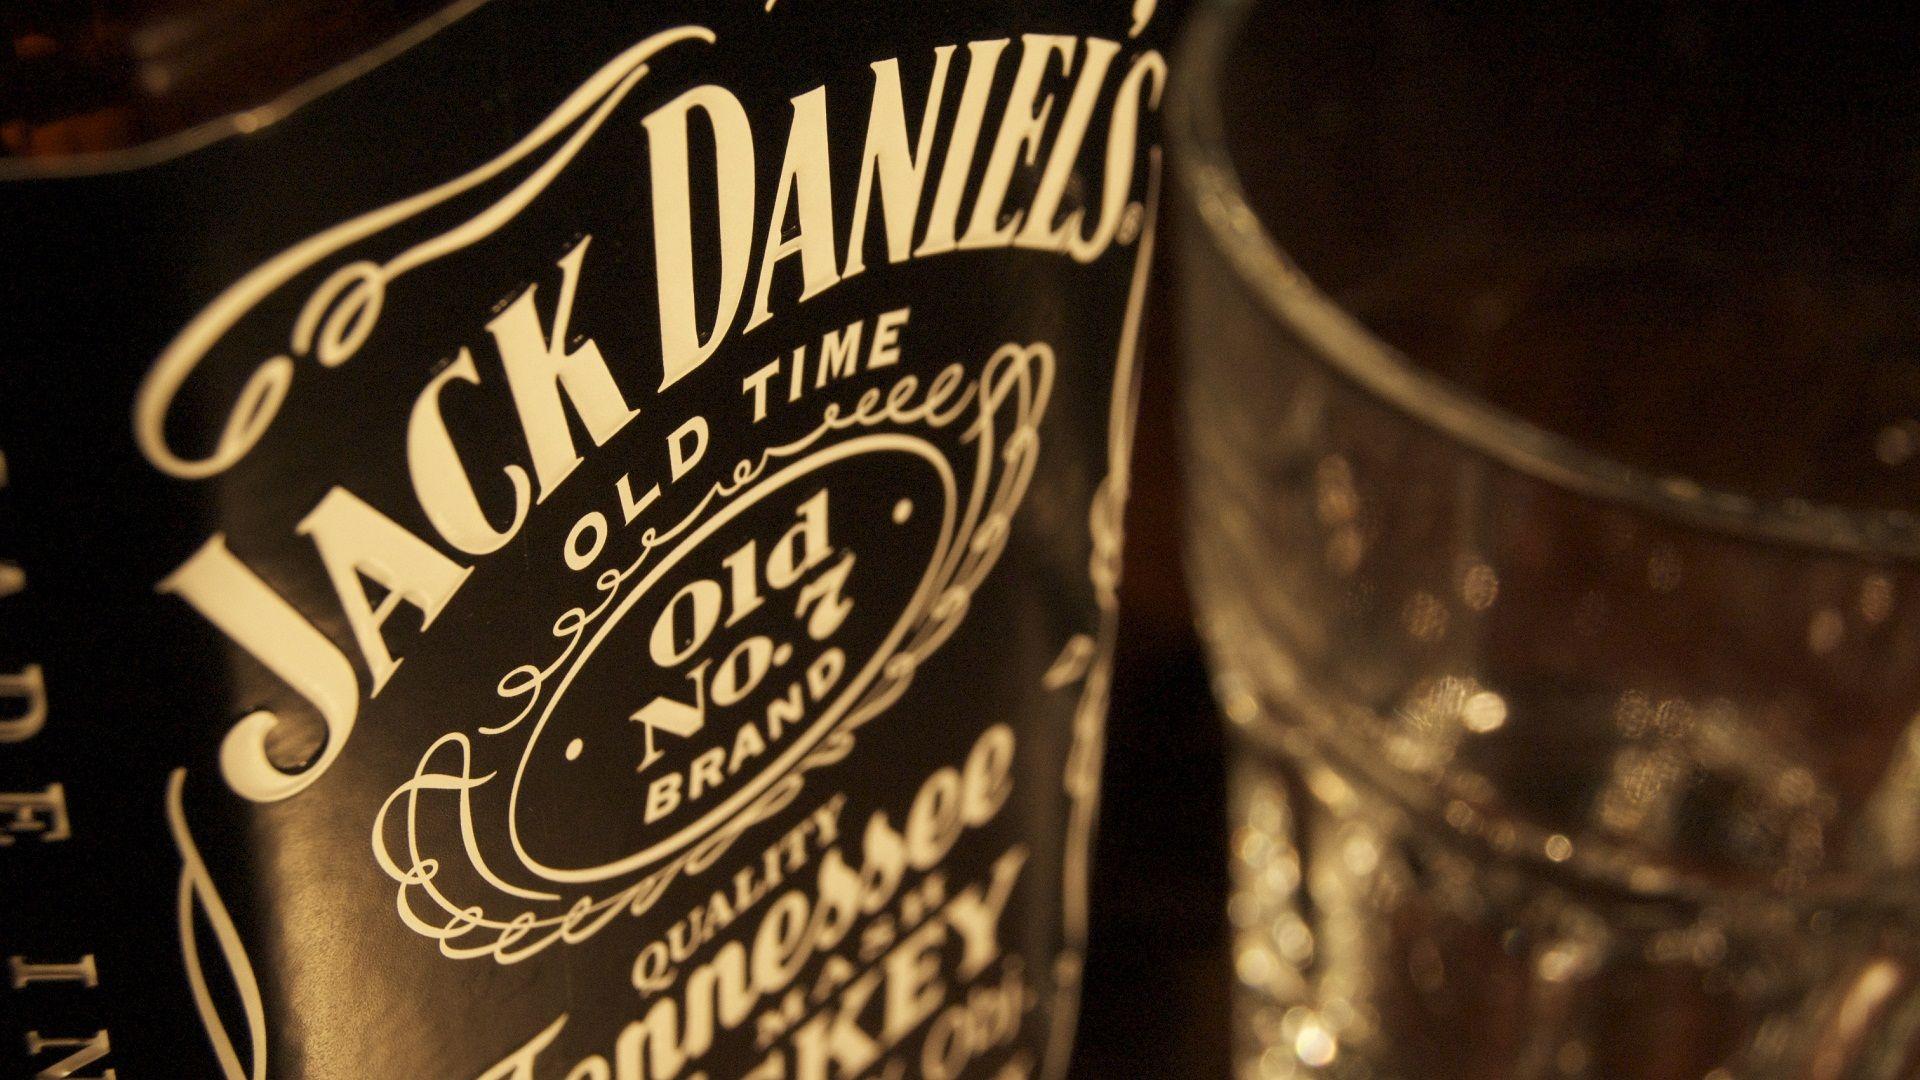 Jack Daniels HQ wallpapers